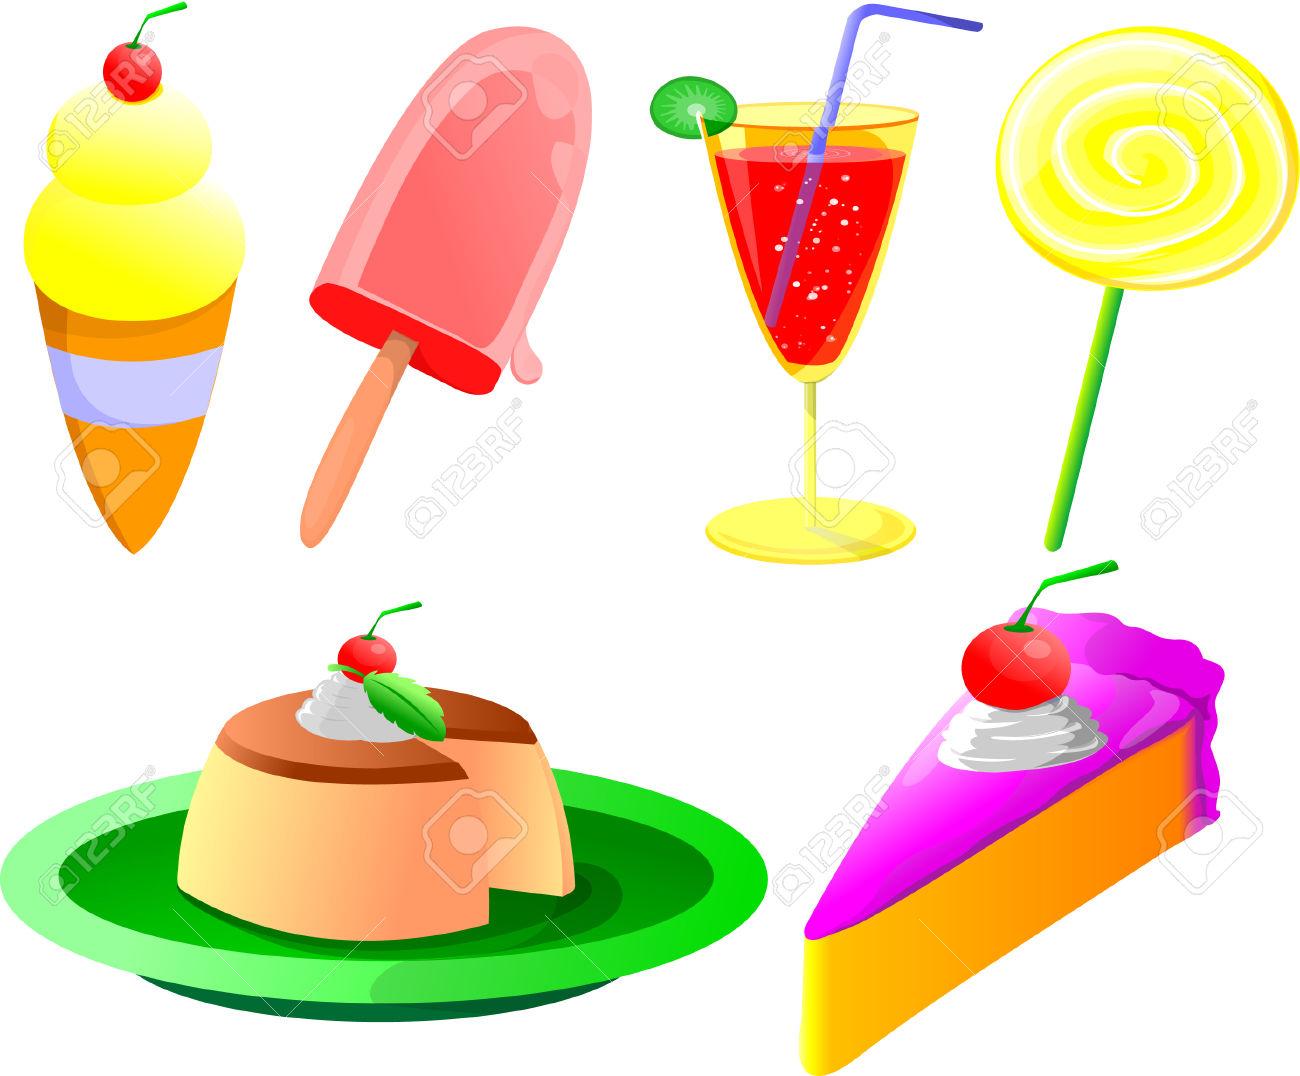 Free cliparts download clip. Taste clipart sweet taste